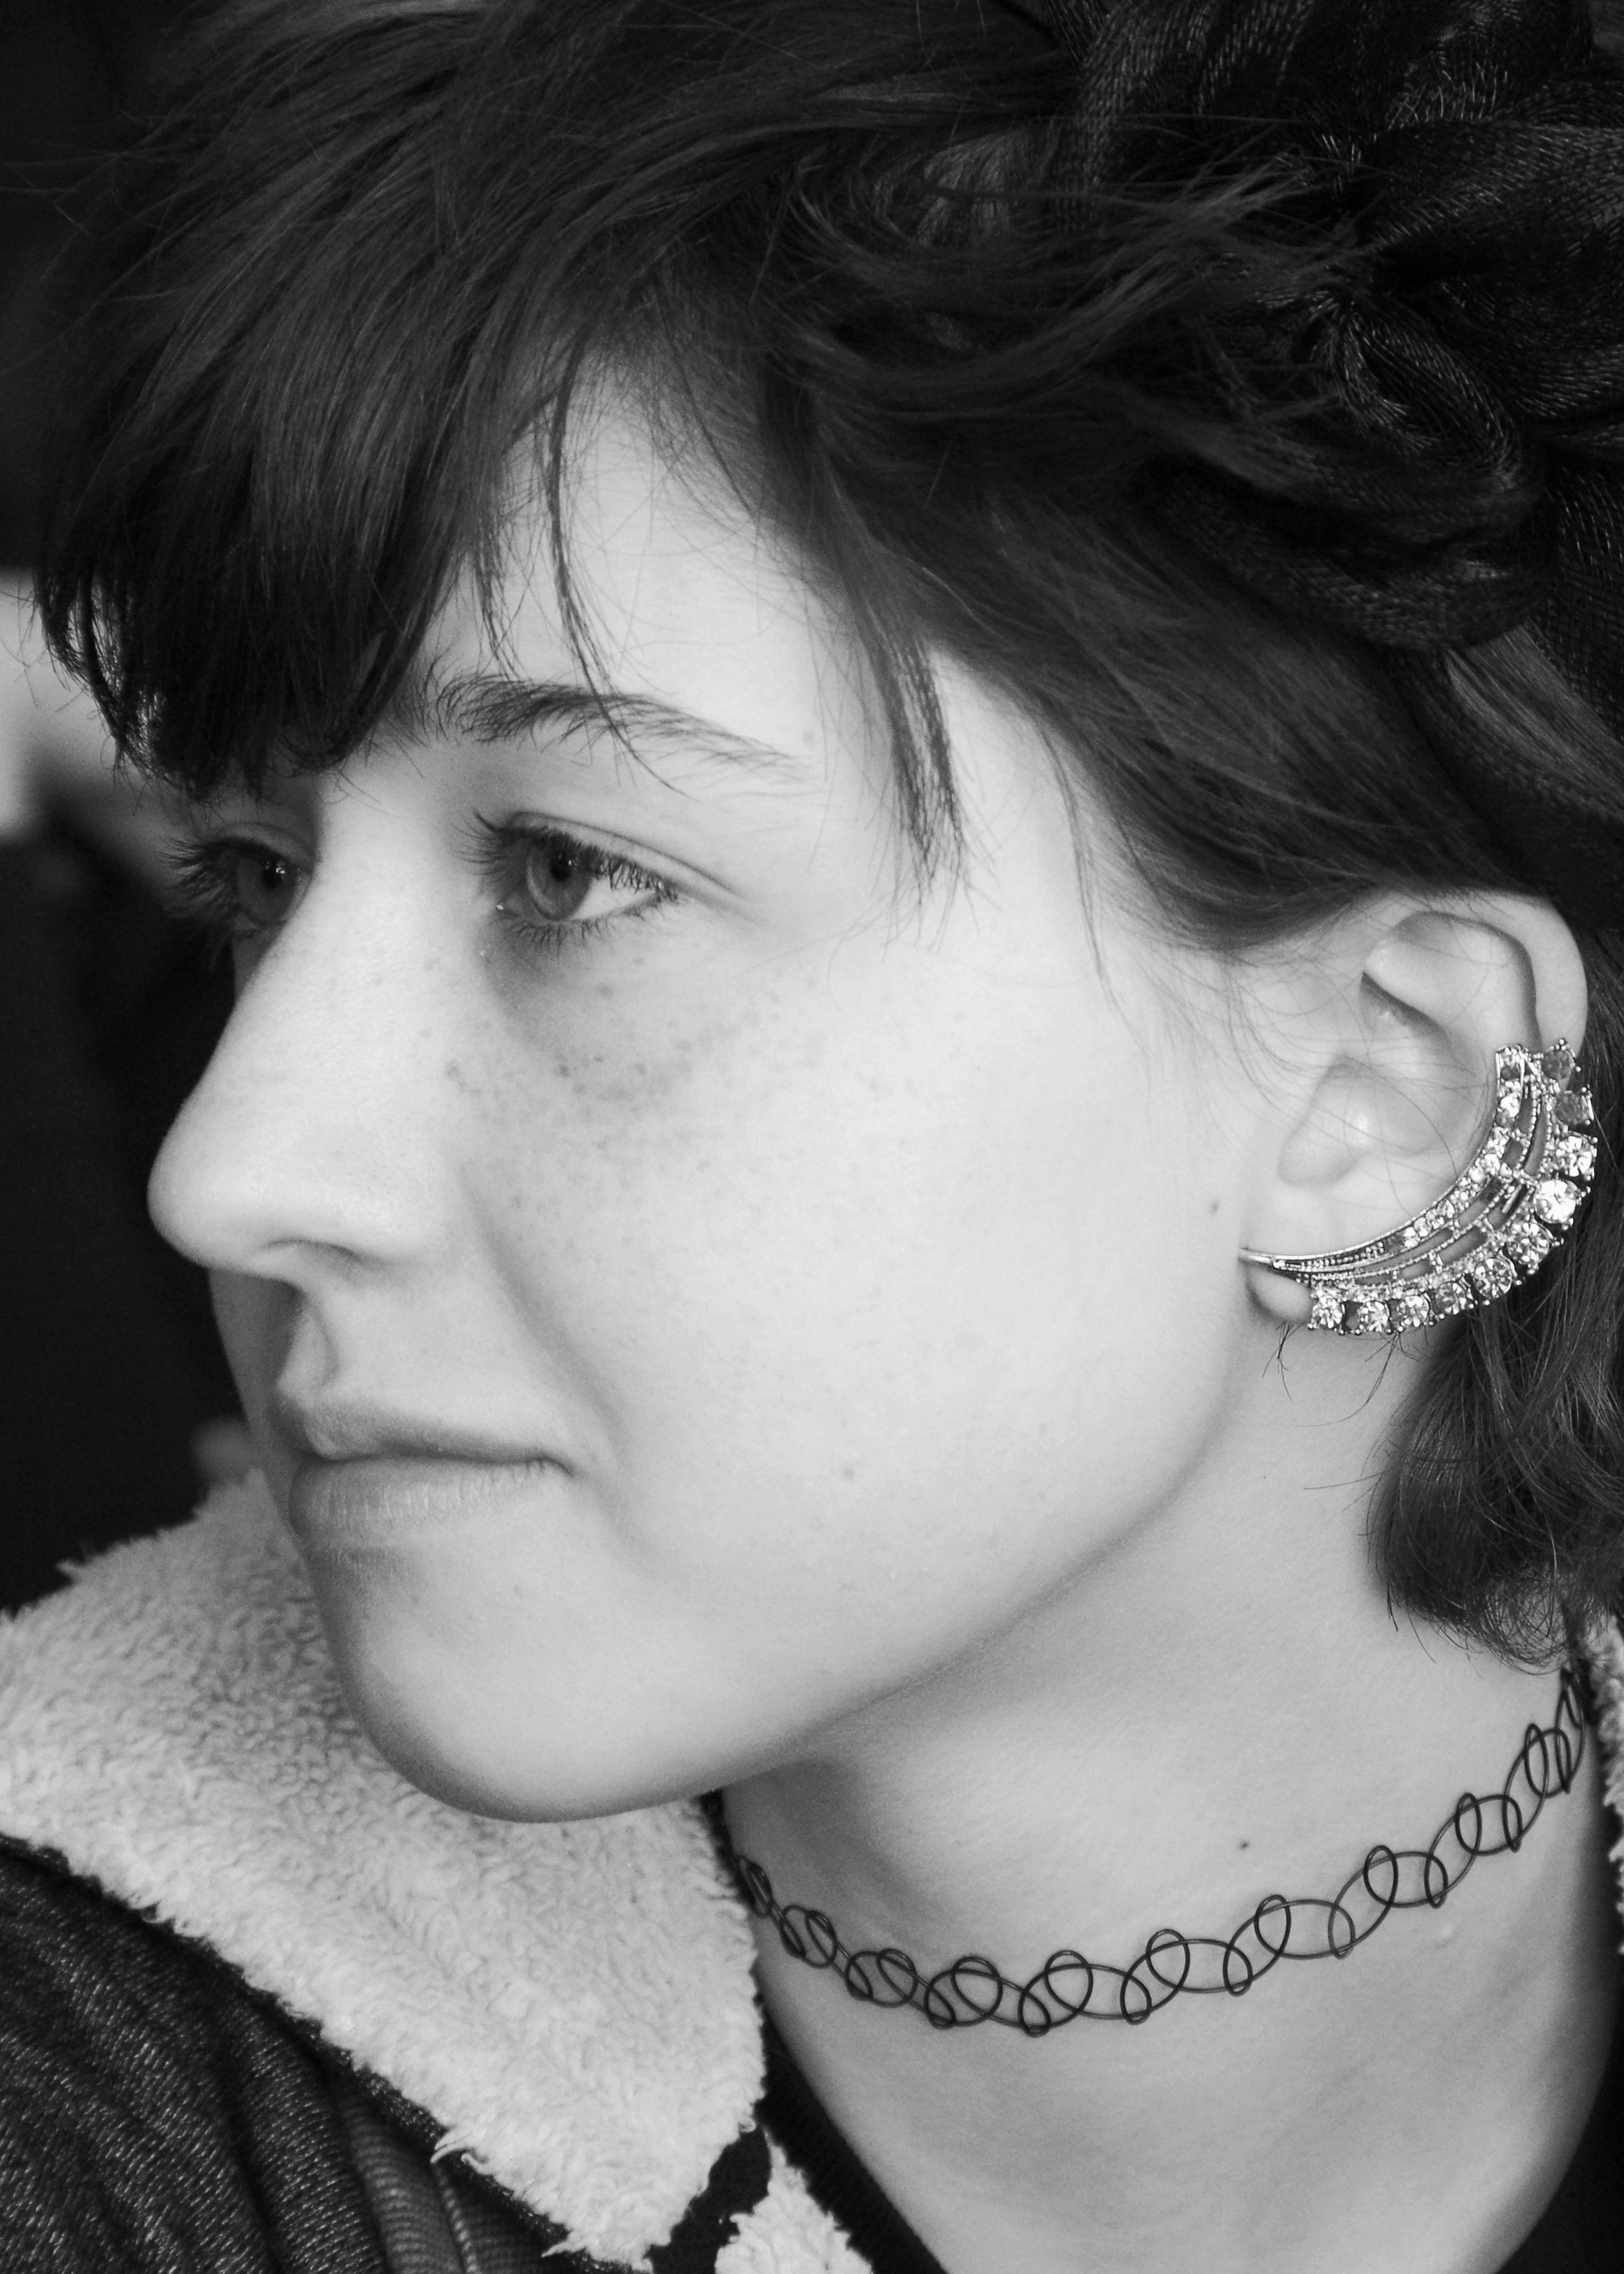 Rae antczak - Age:195'9